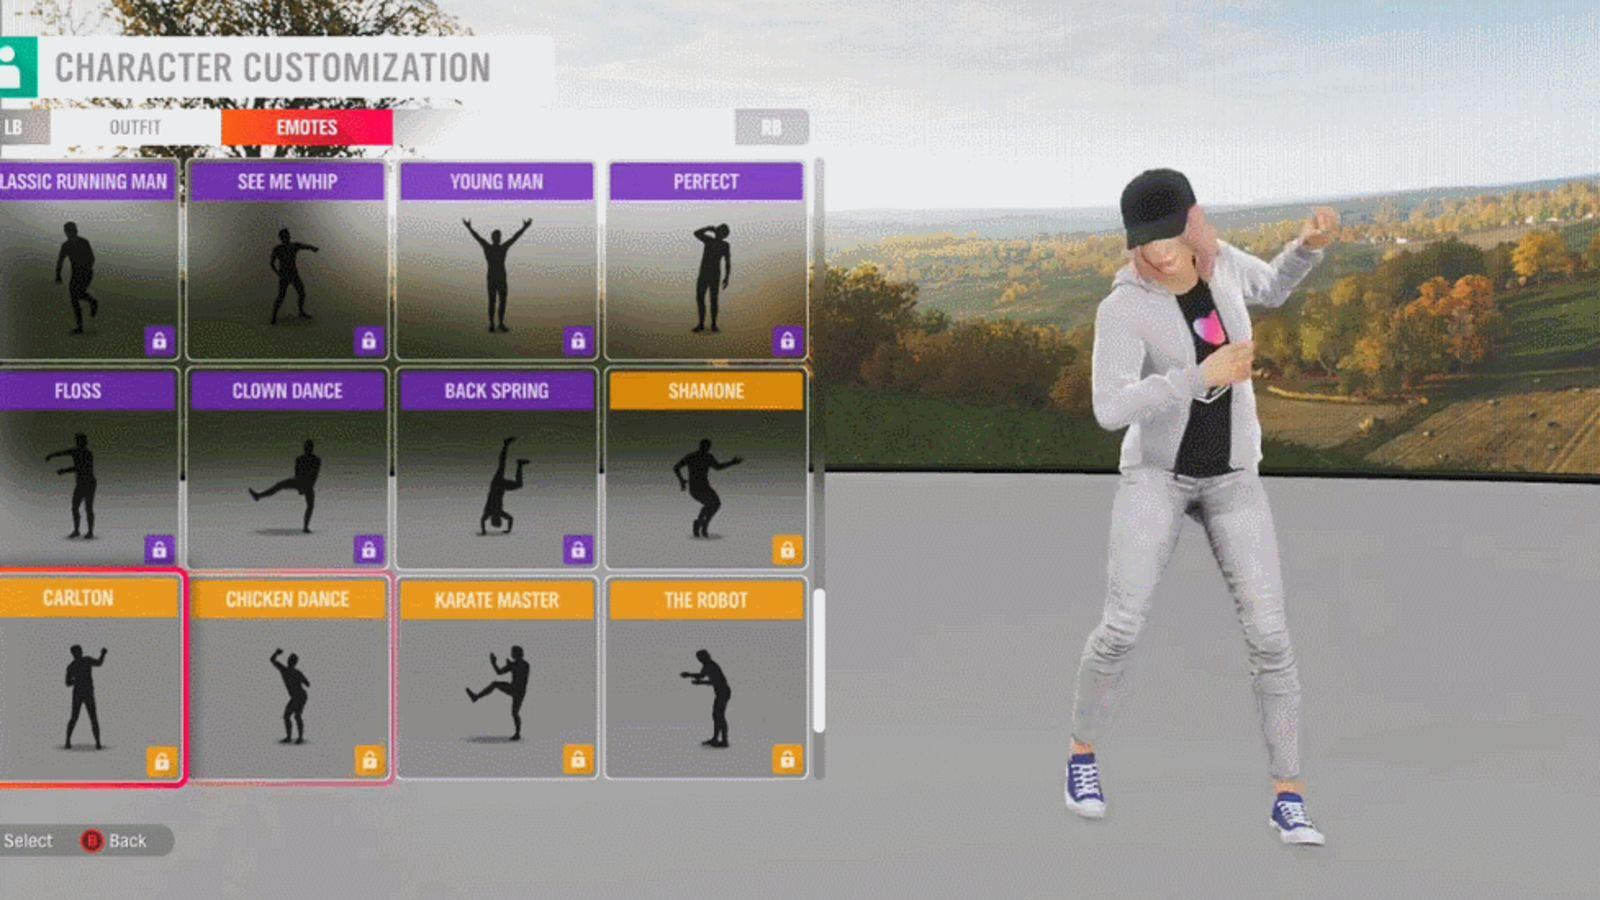 The 'Carlton' emote in 'Forza Horizon 4'. Credit: Playground Games/Microsoft